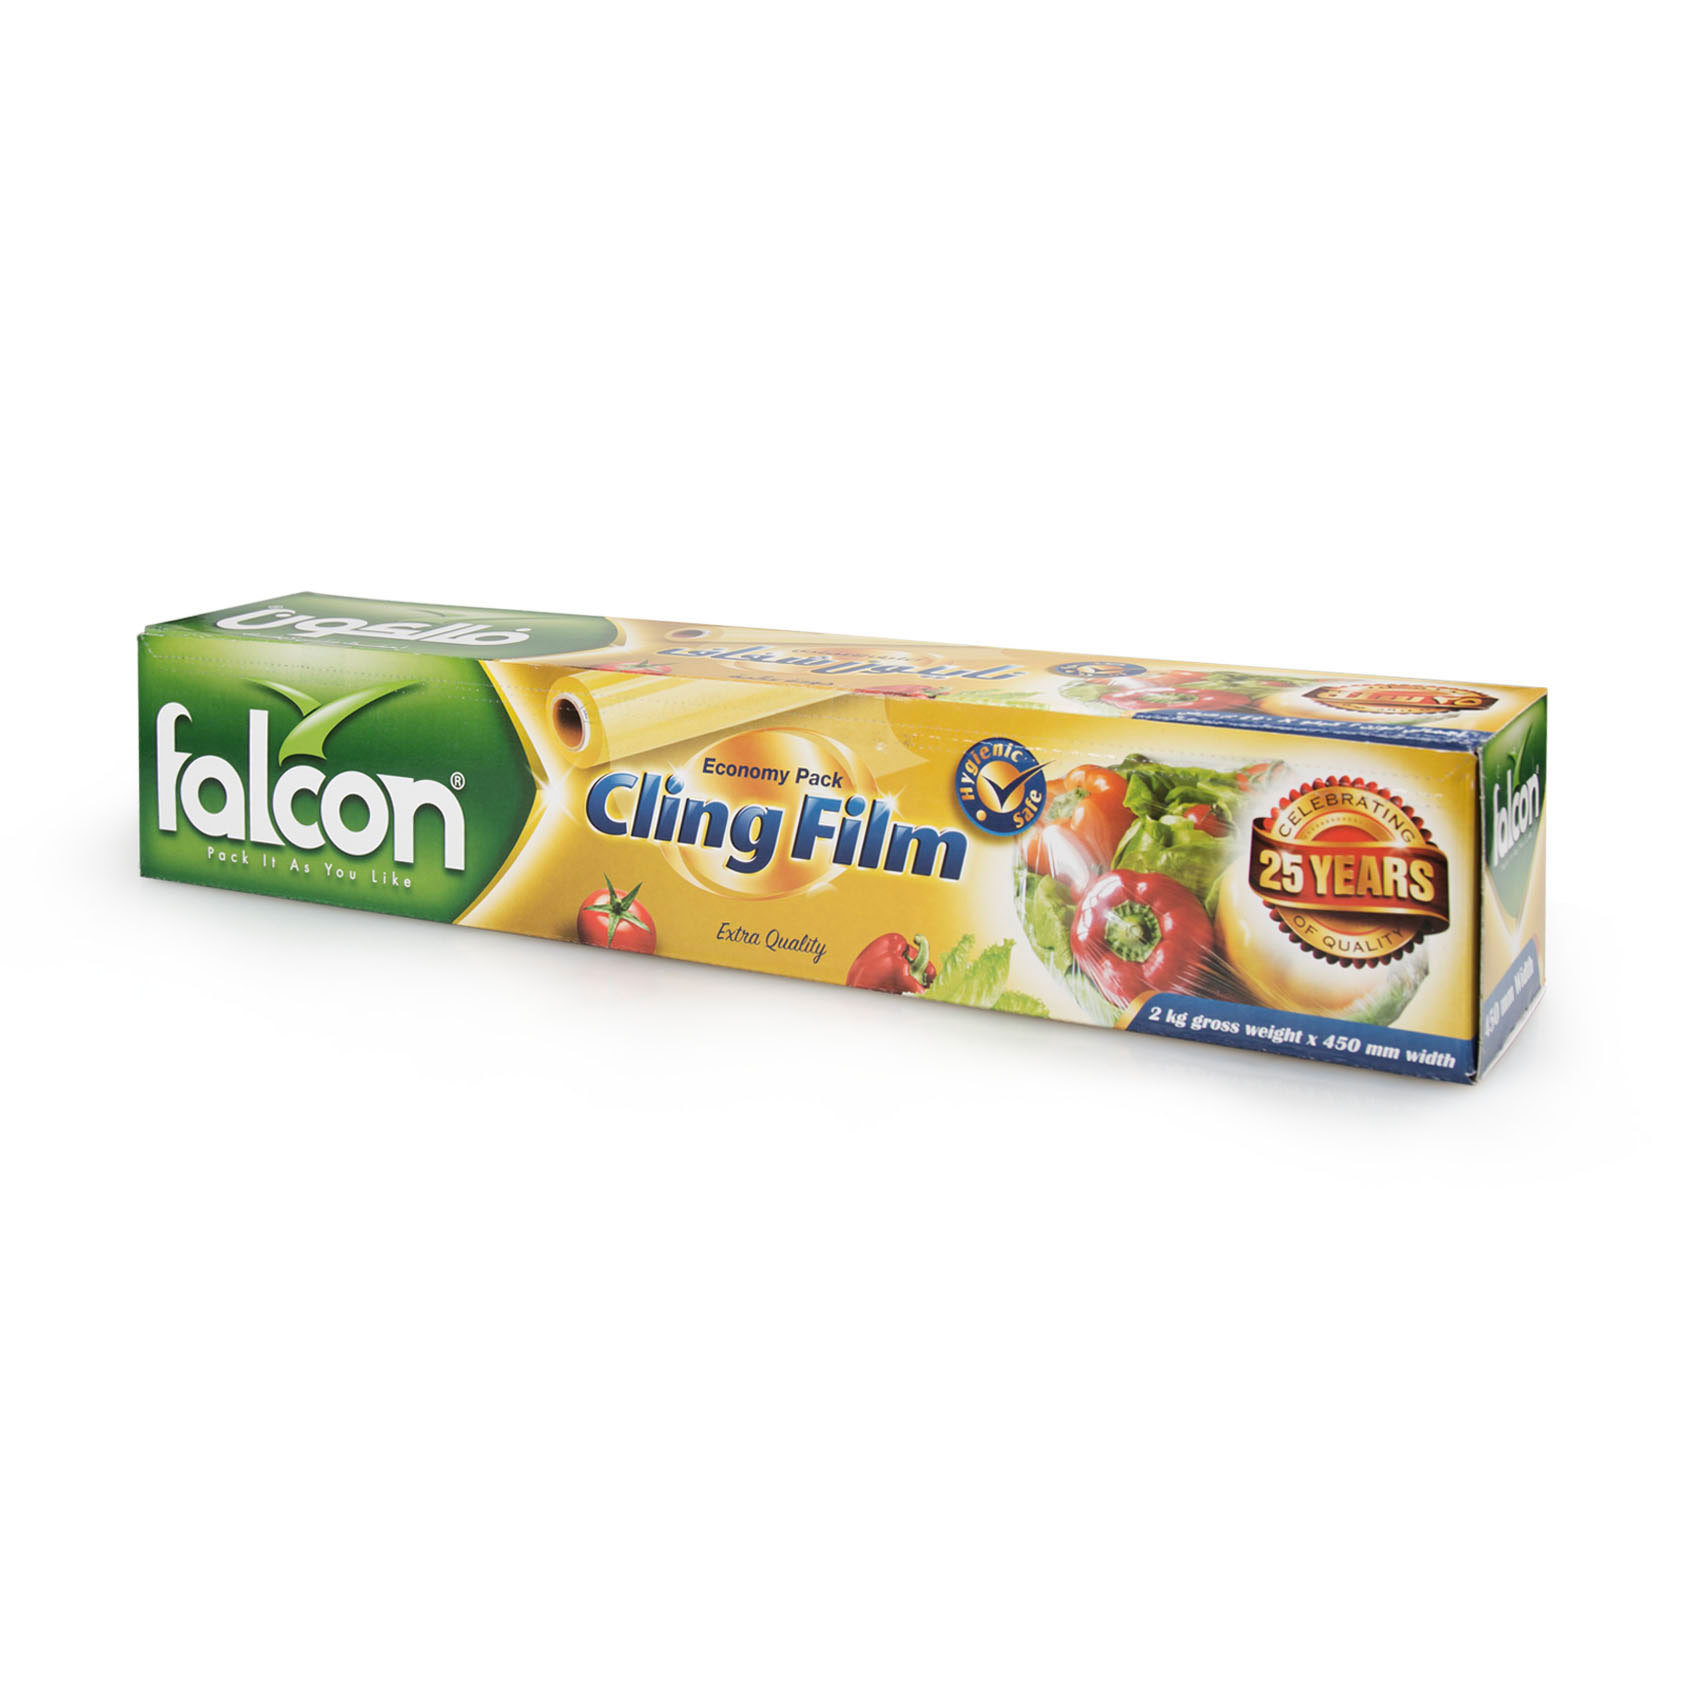 FALCON CLING FILM 300ML